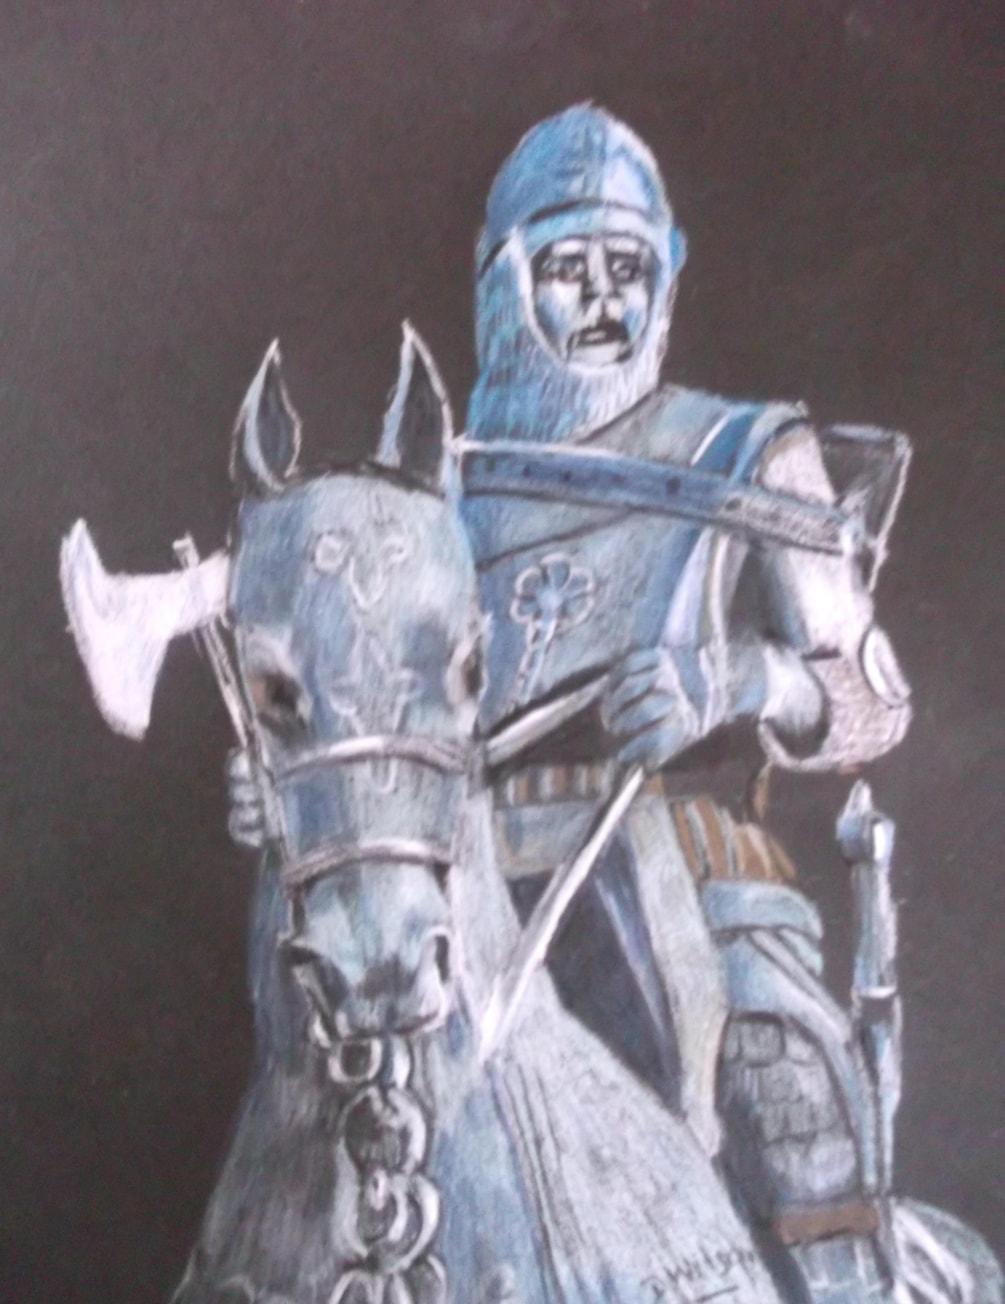 King Robert The Bruce Statue at Bannockburn